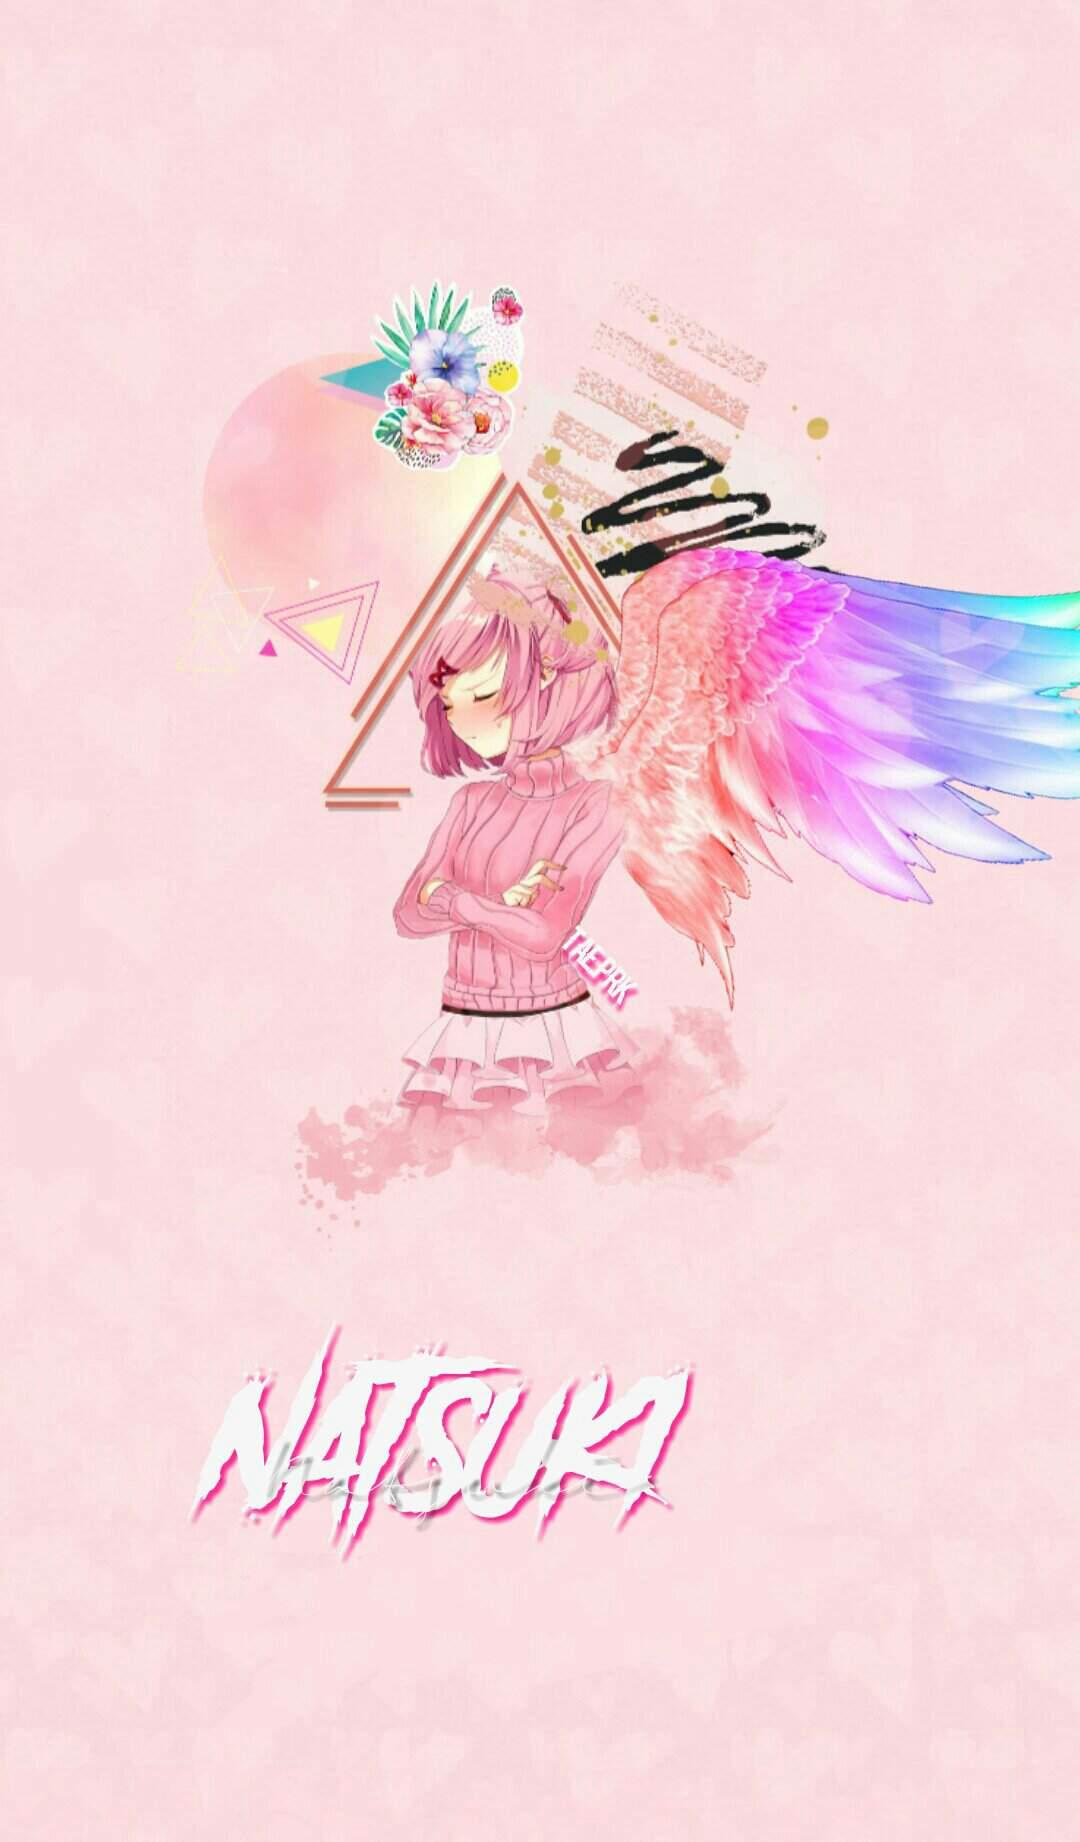 Natsuki Cute Edit Wallpaper Doki Doki Literature Club Amino